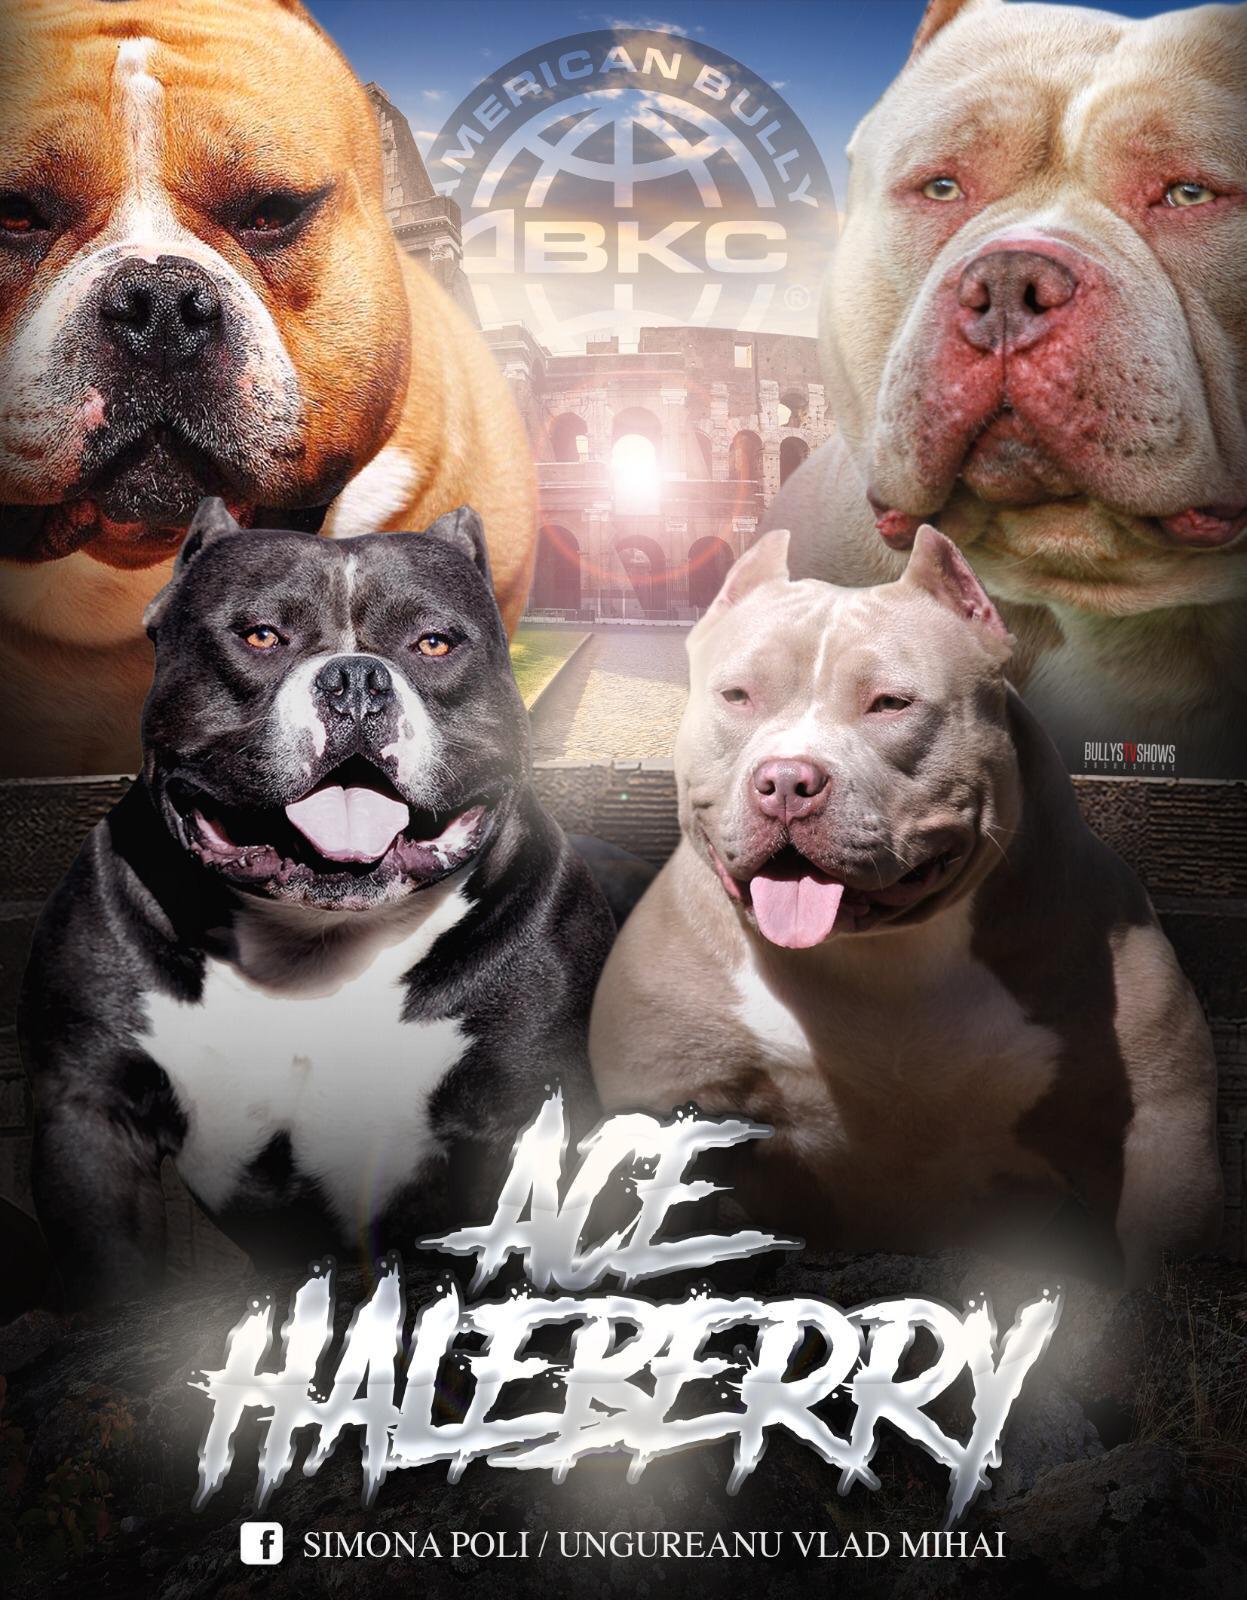 Ace X Haleberry